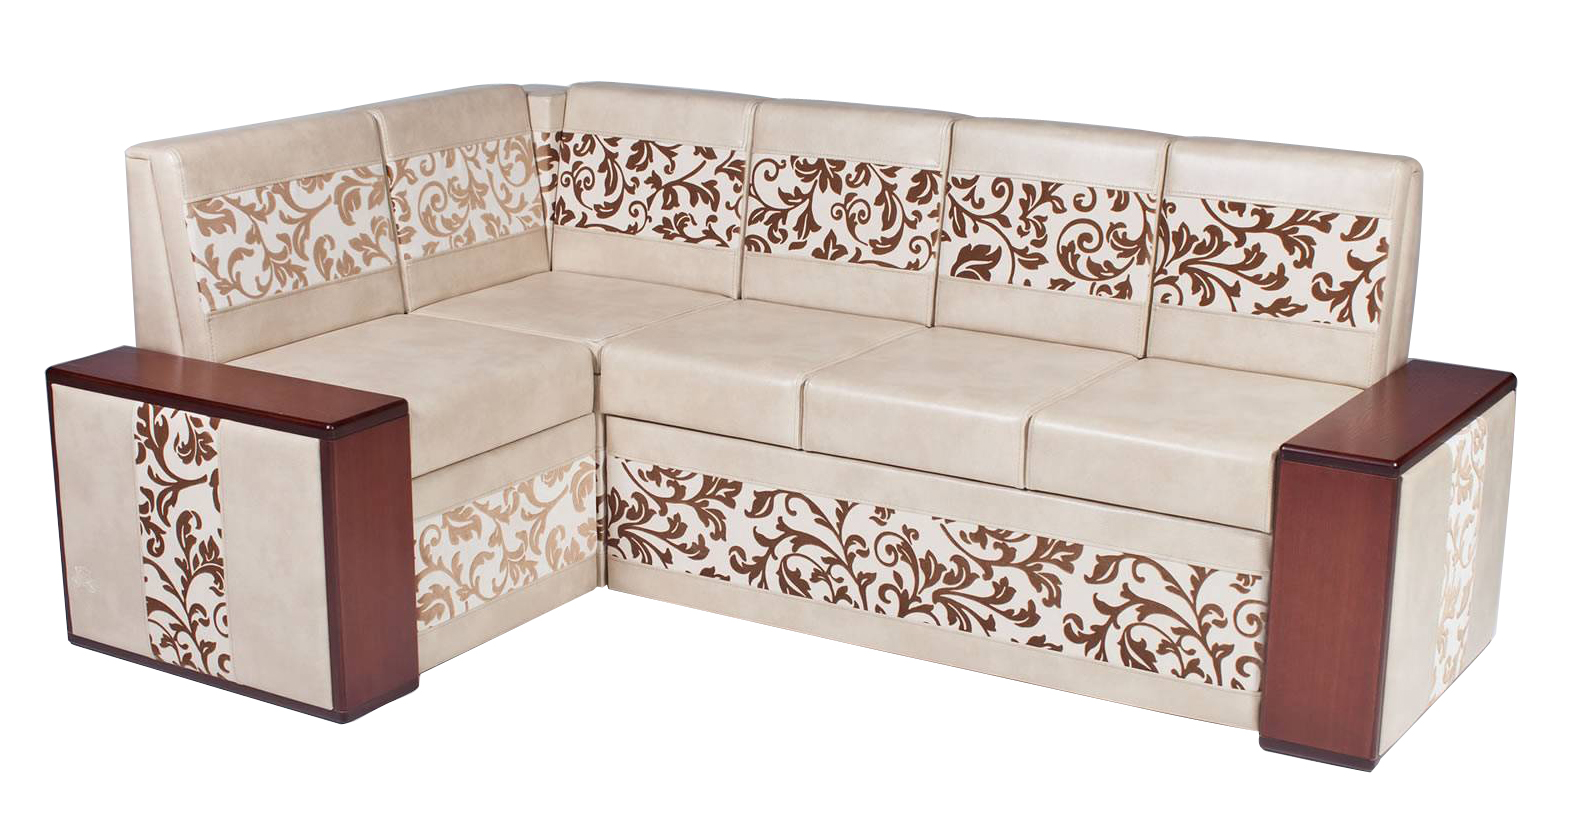 Кухонный угловой диван Остин-Т диван остин от бора 74